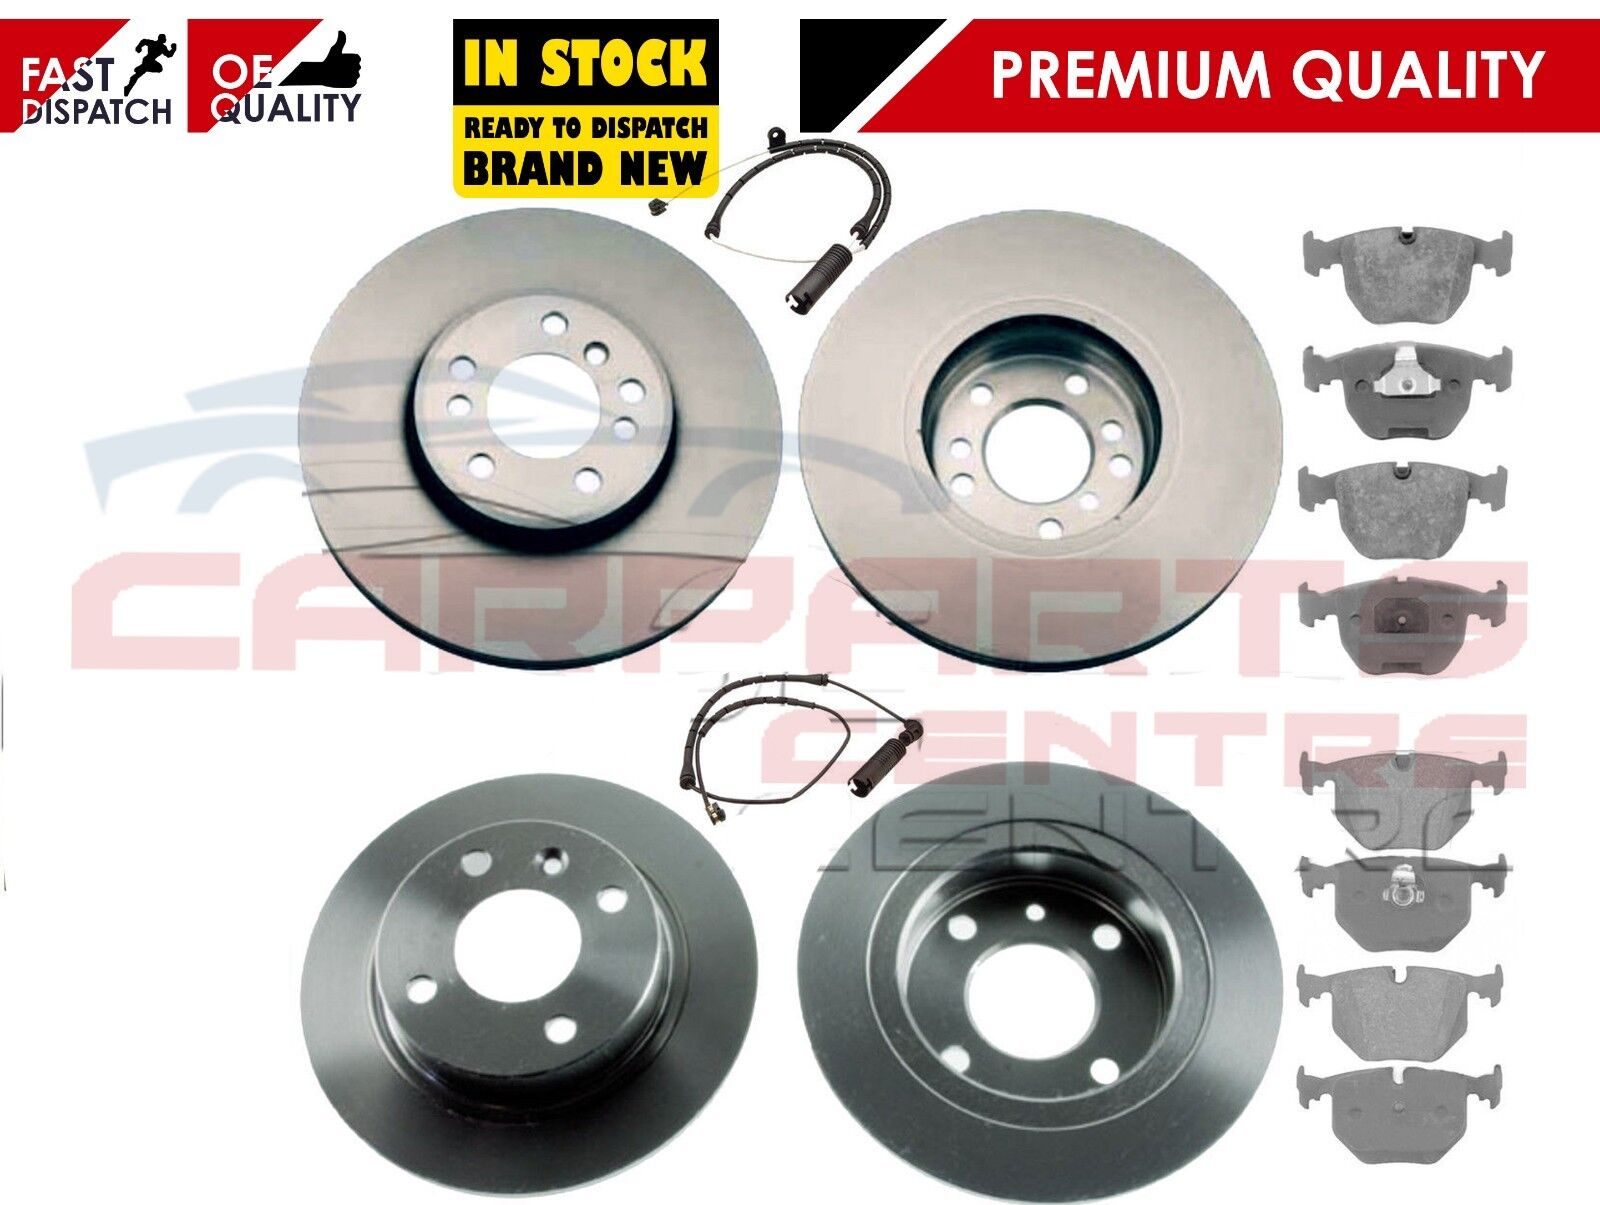 FOR BMW X5 E53 3.0 D 3.0i 00-06 FRONT /& REAR BRAKE DISC DISCS PADS SENSORS